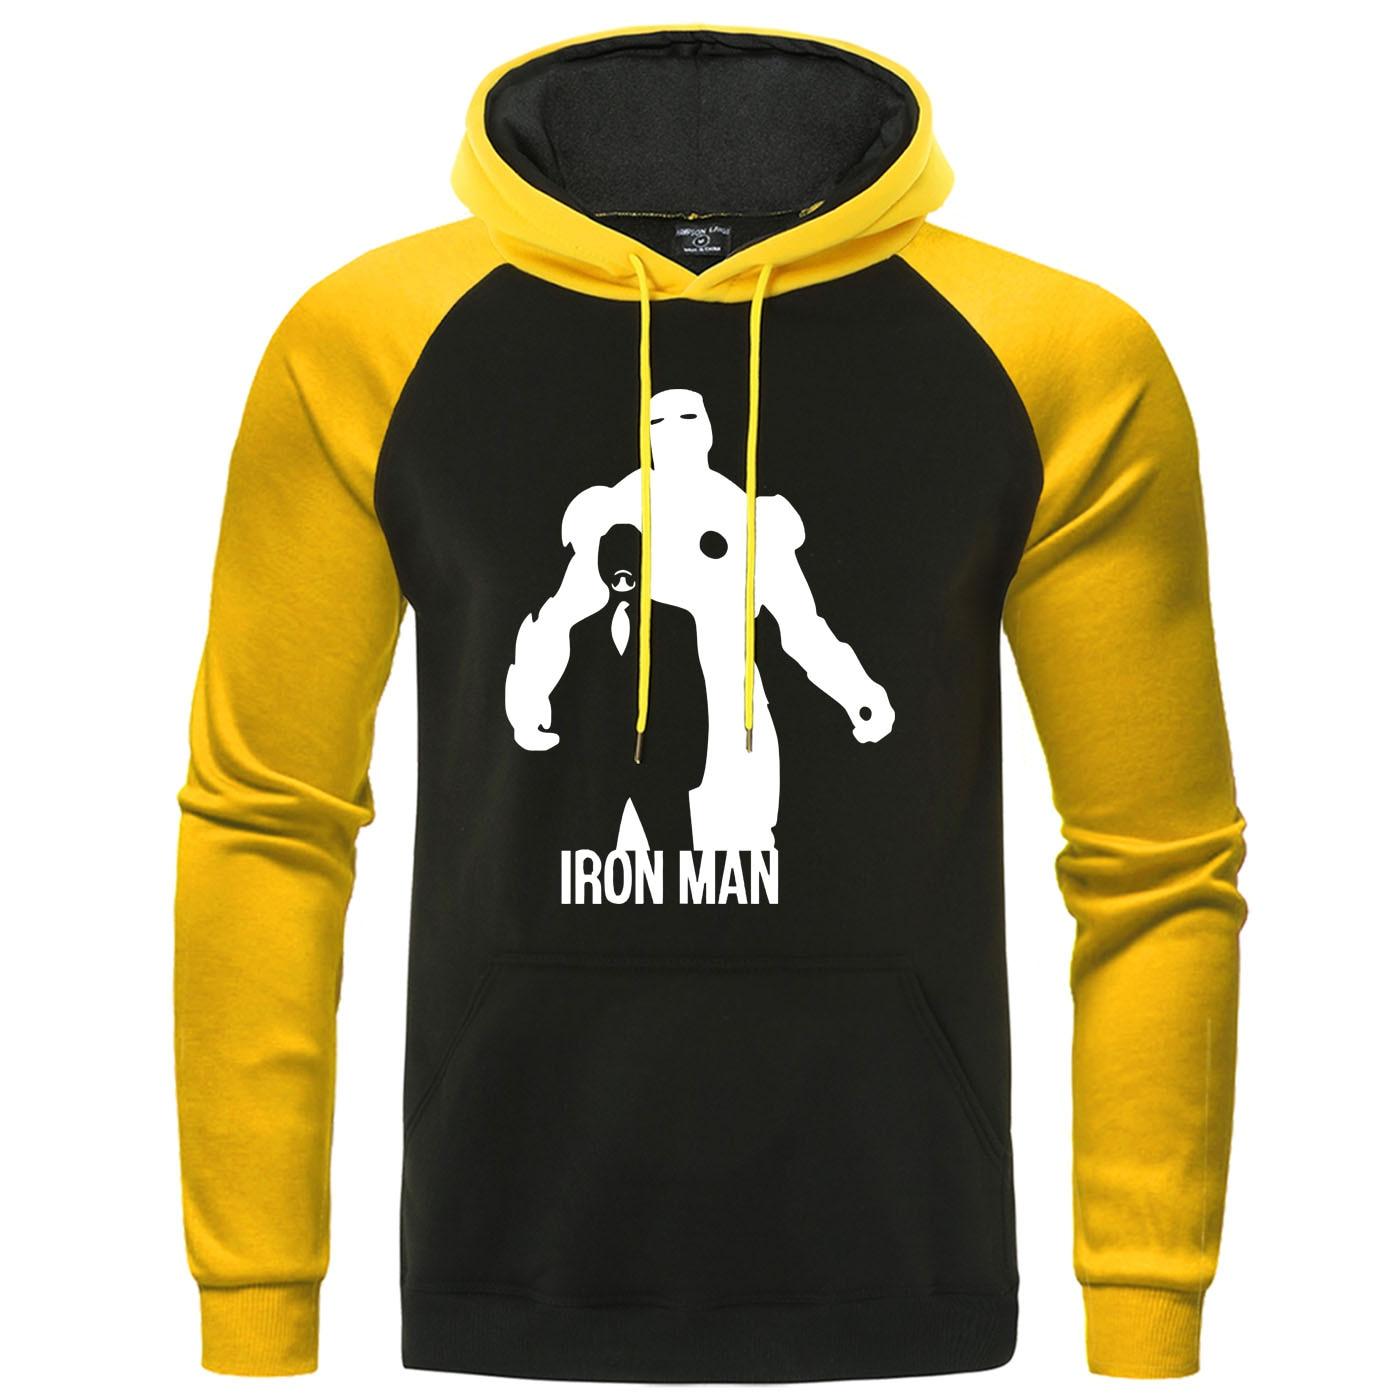 Iron Man Hoodies Autumn Fleece Warm Fitness Casual Men Raglan Pullover Camisas Tracksuit Tony Stark Print Men's Brand Sweatshirt